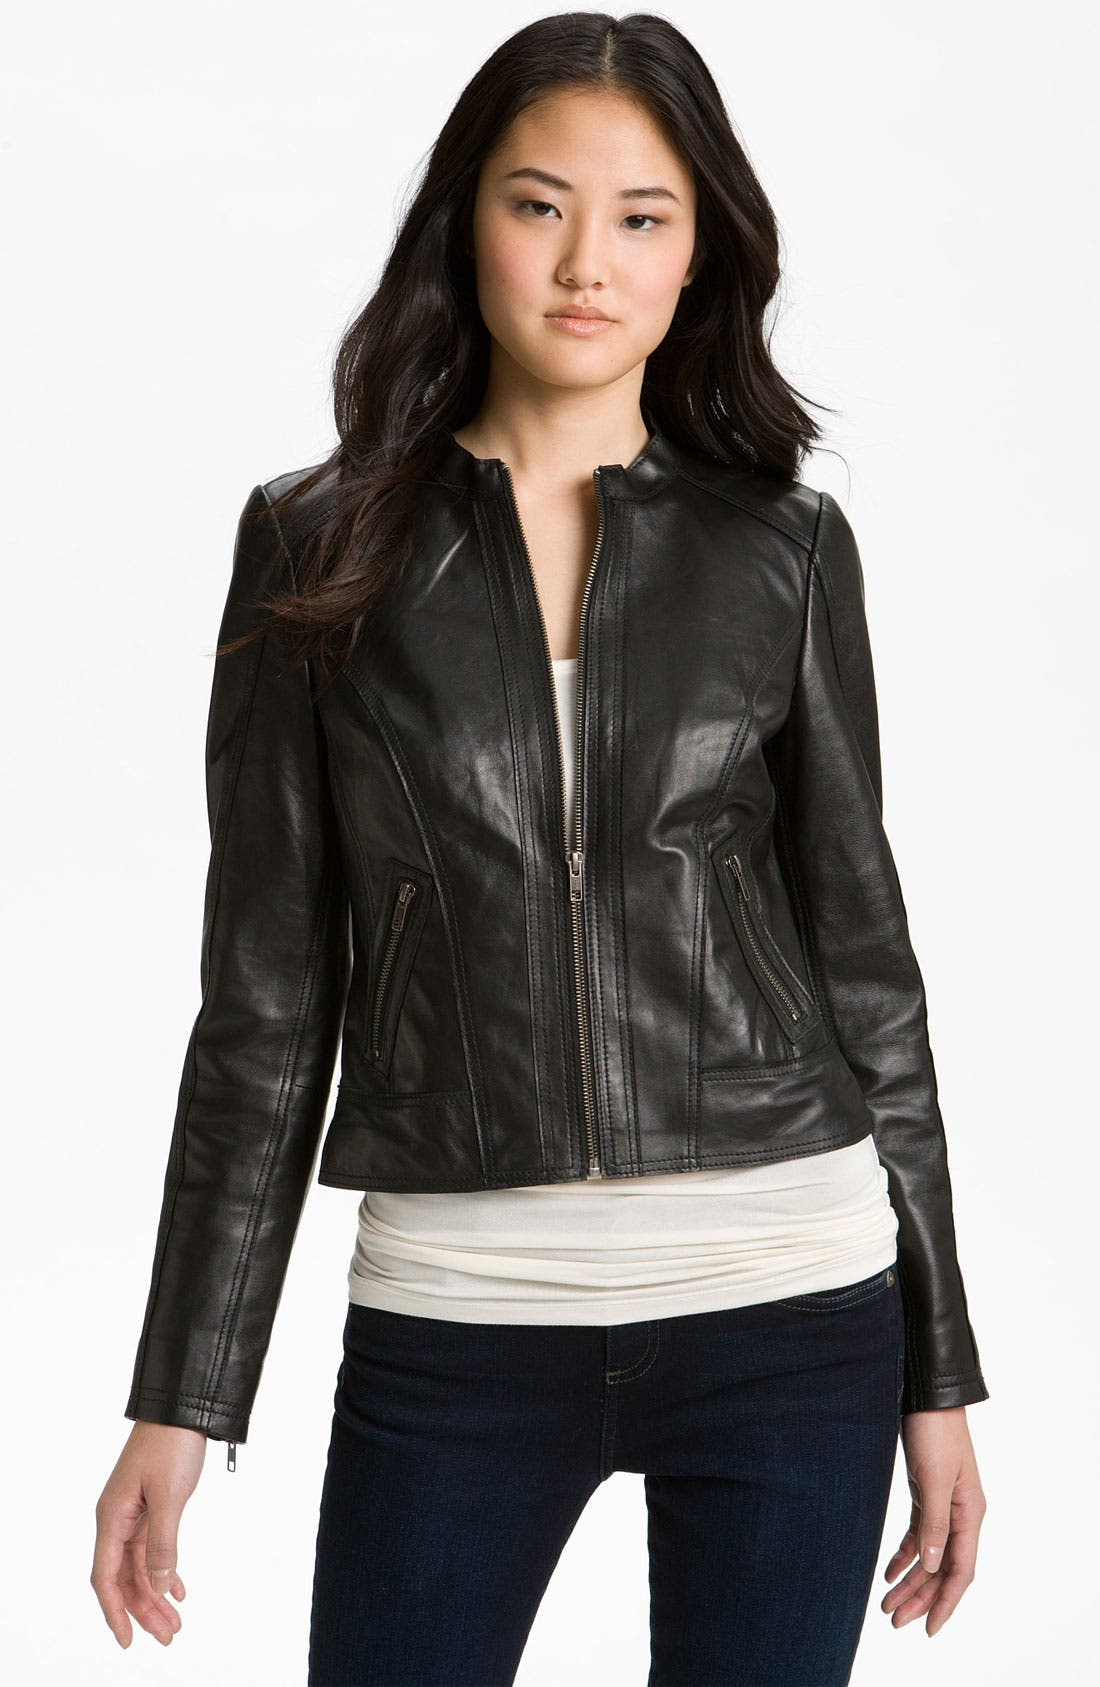 Alternate Image 1 Selected - Halogen® Seamed Leather Jacket (Petite)